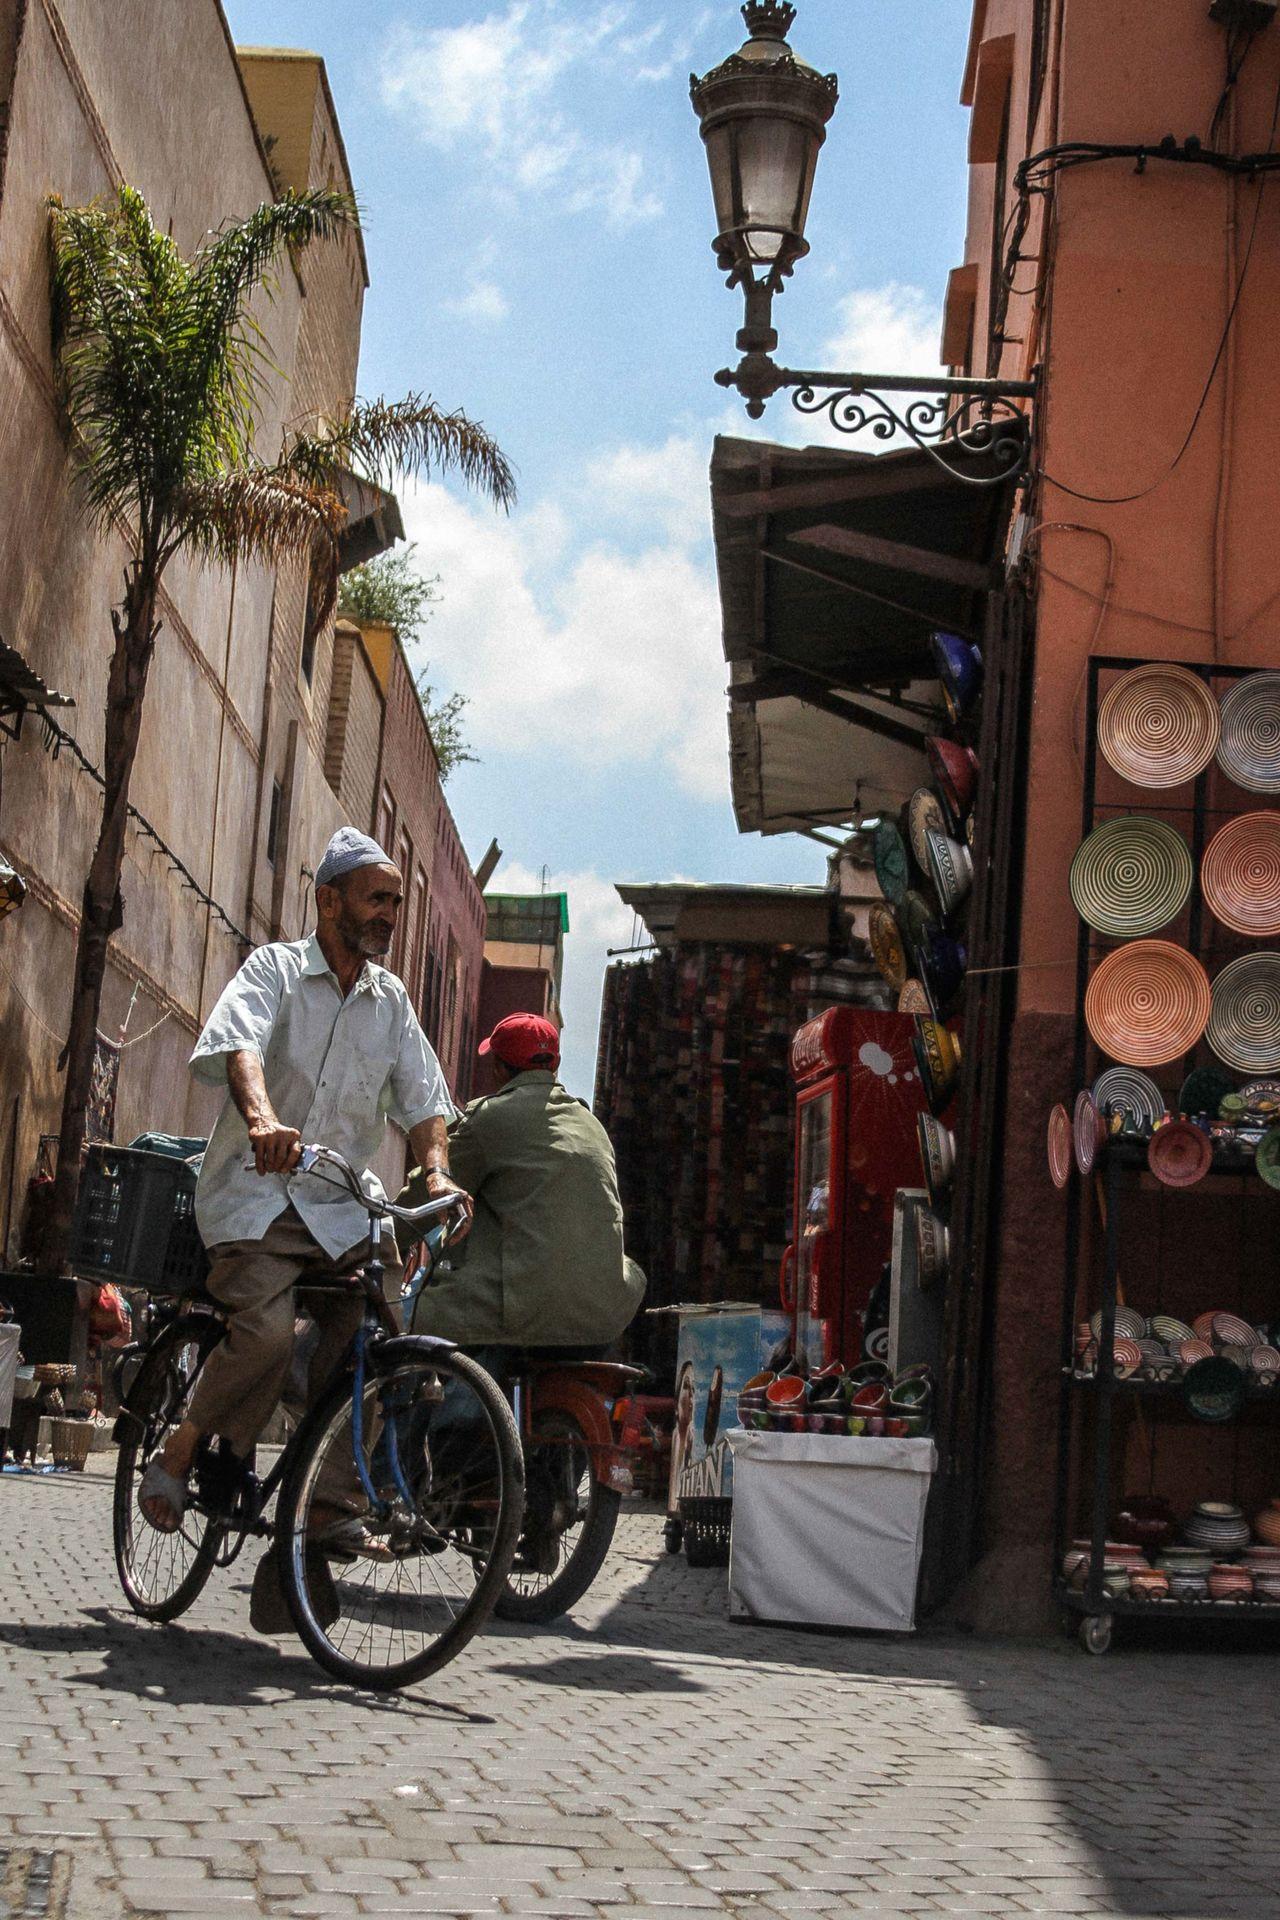 Beautiful stock photos of fahrrad, building exterior, travel, city, outdoors